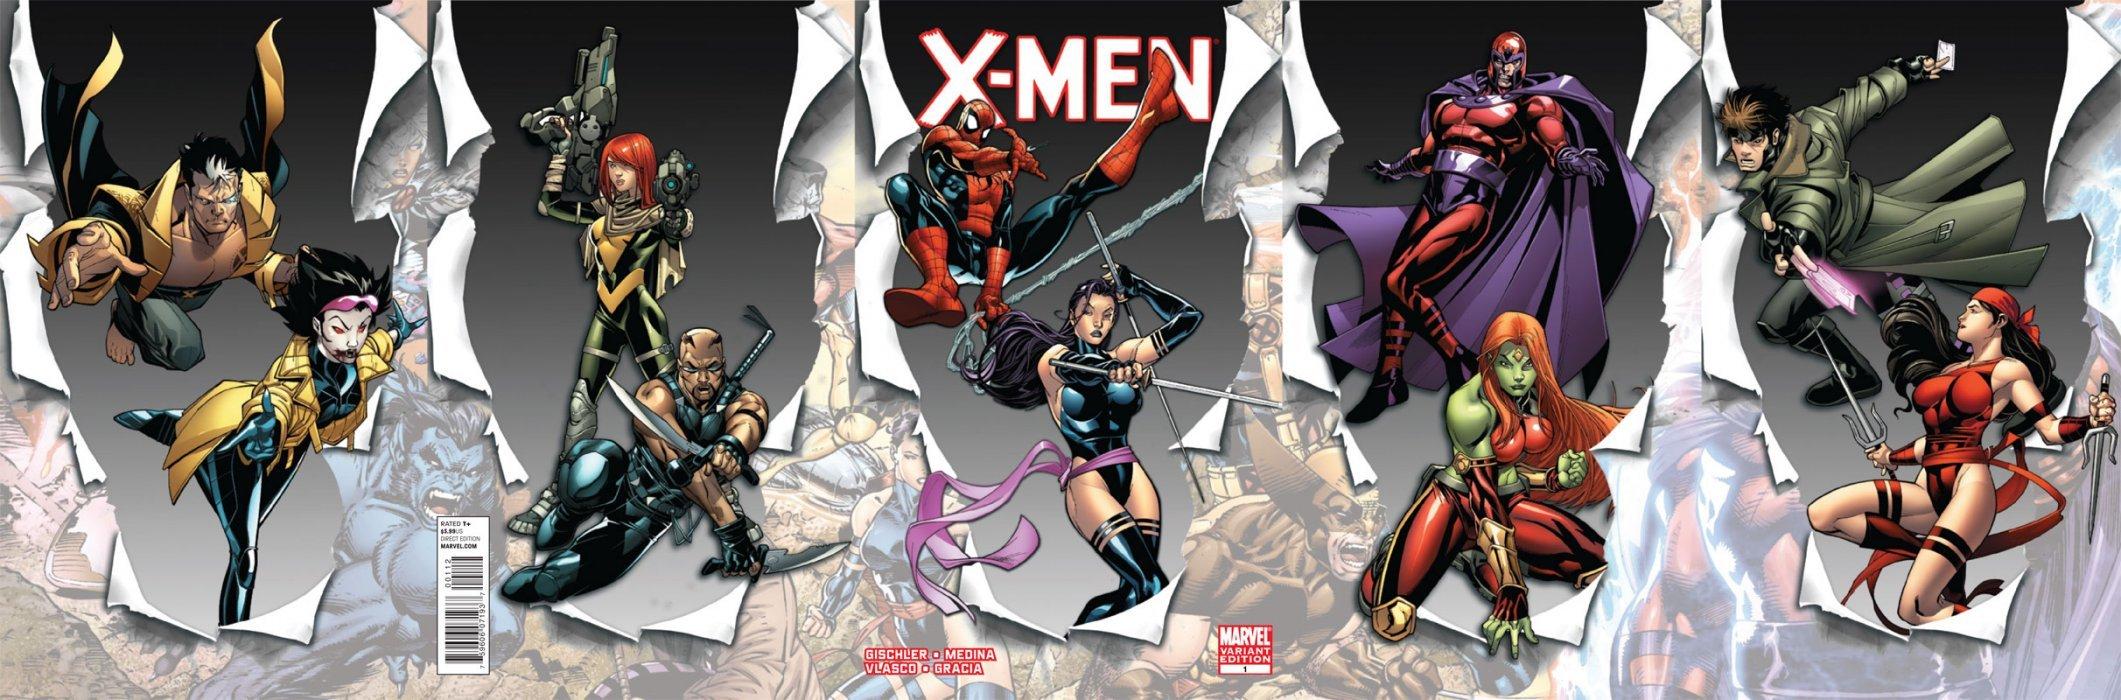 X-Men Vol 3 1 Medina Gatefold Party Variant.jpg